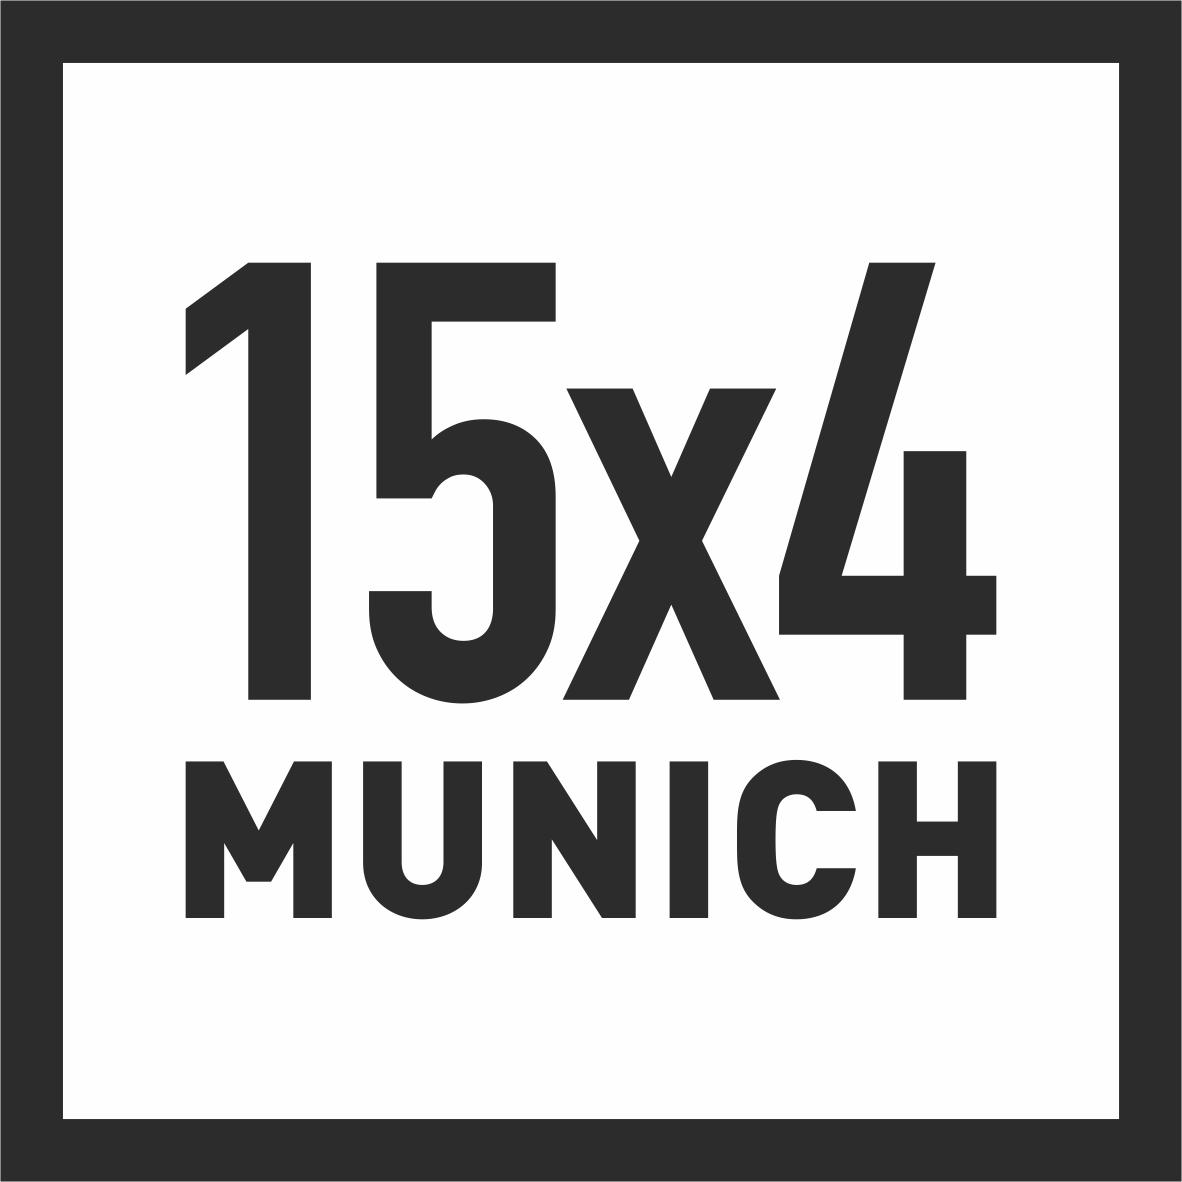 15x4 Munich